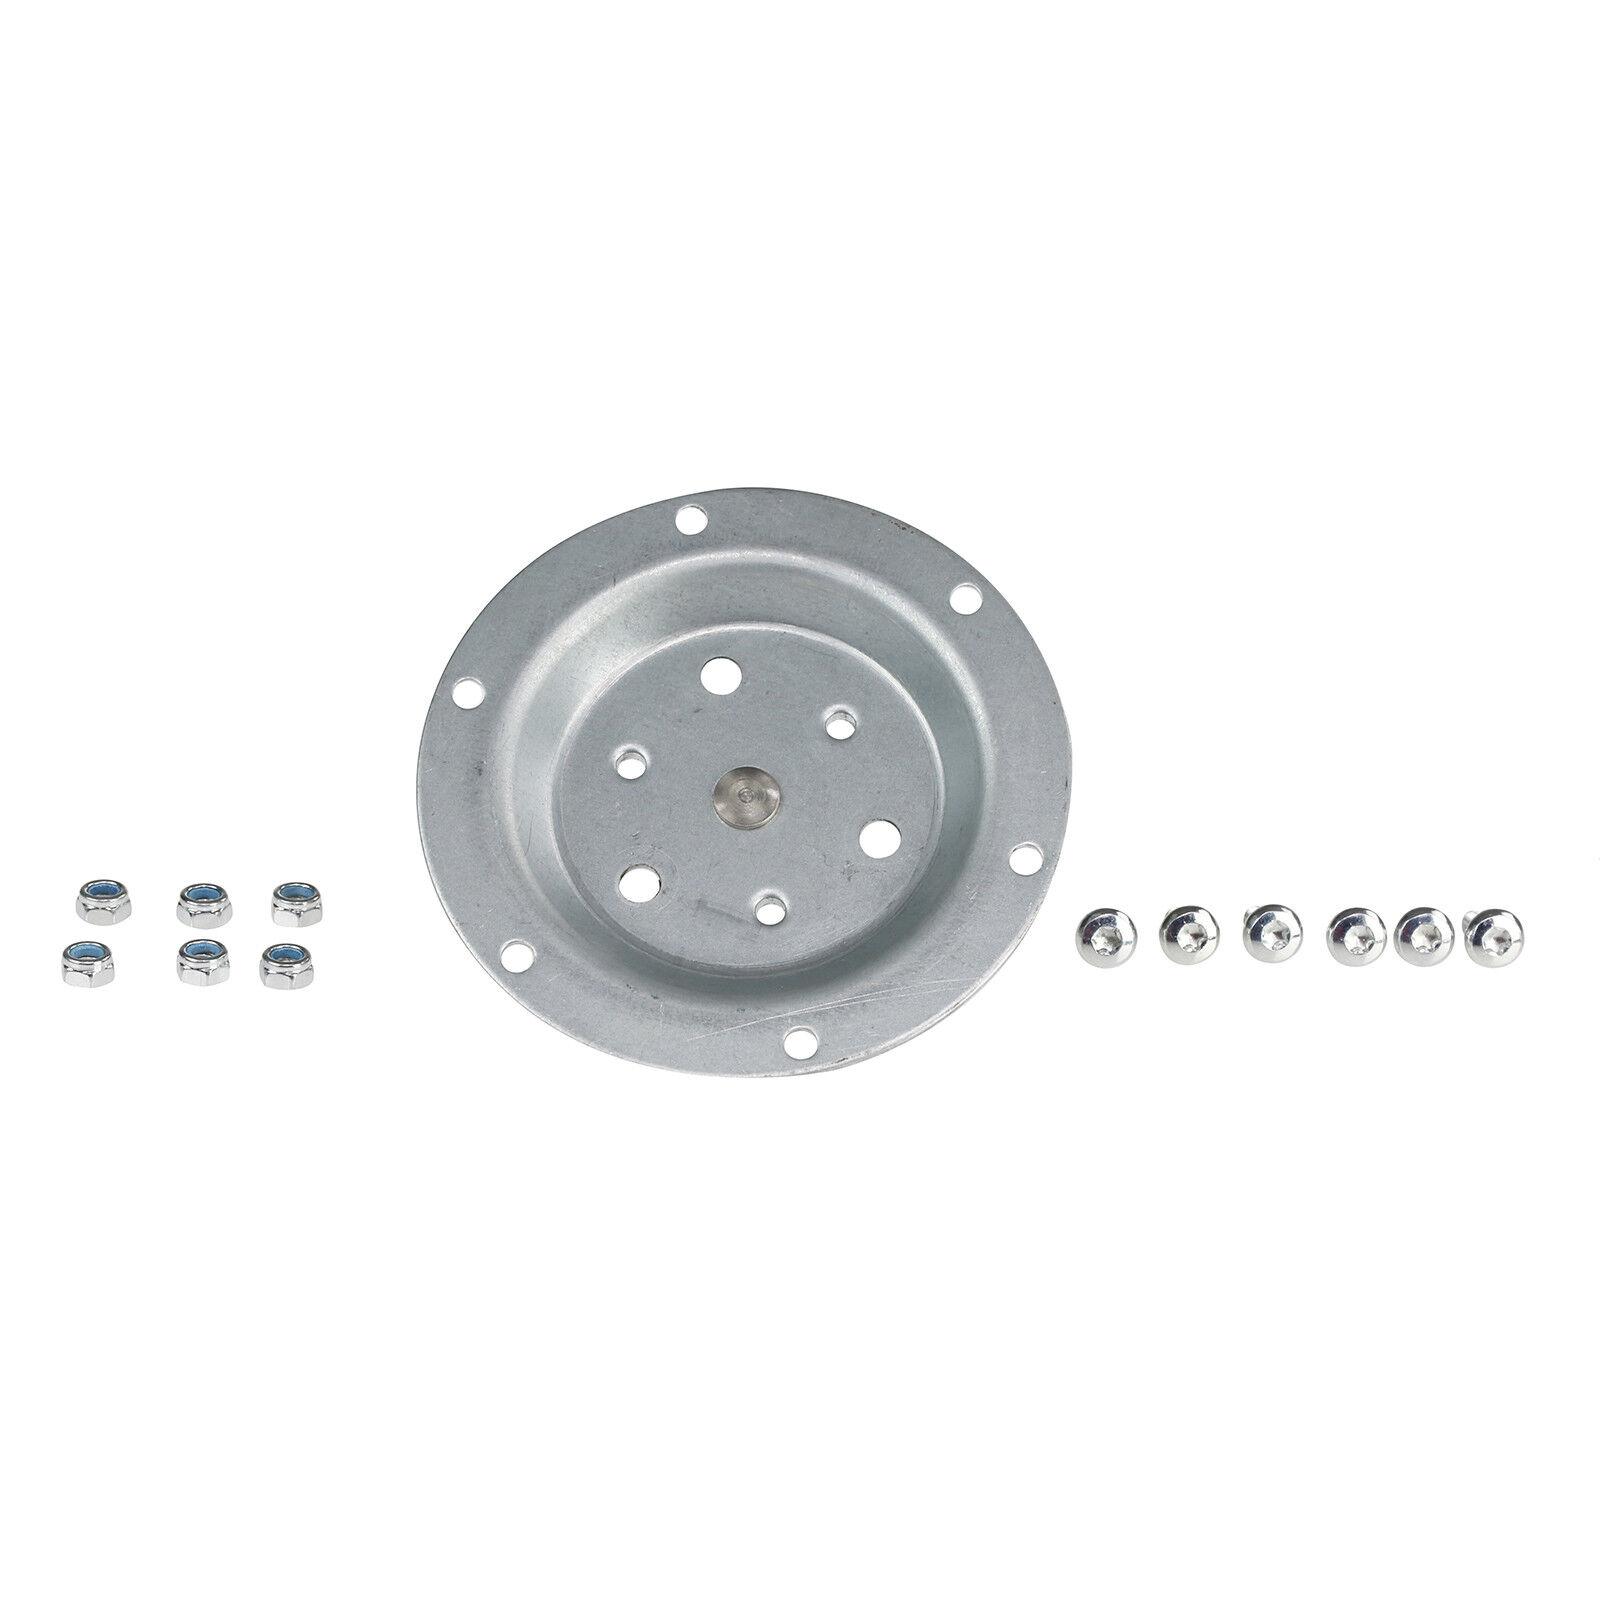 Hotpoint TVM572G Tumble Dryer Drum Rear Bearing